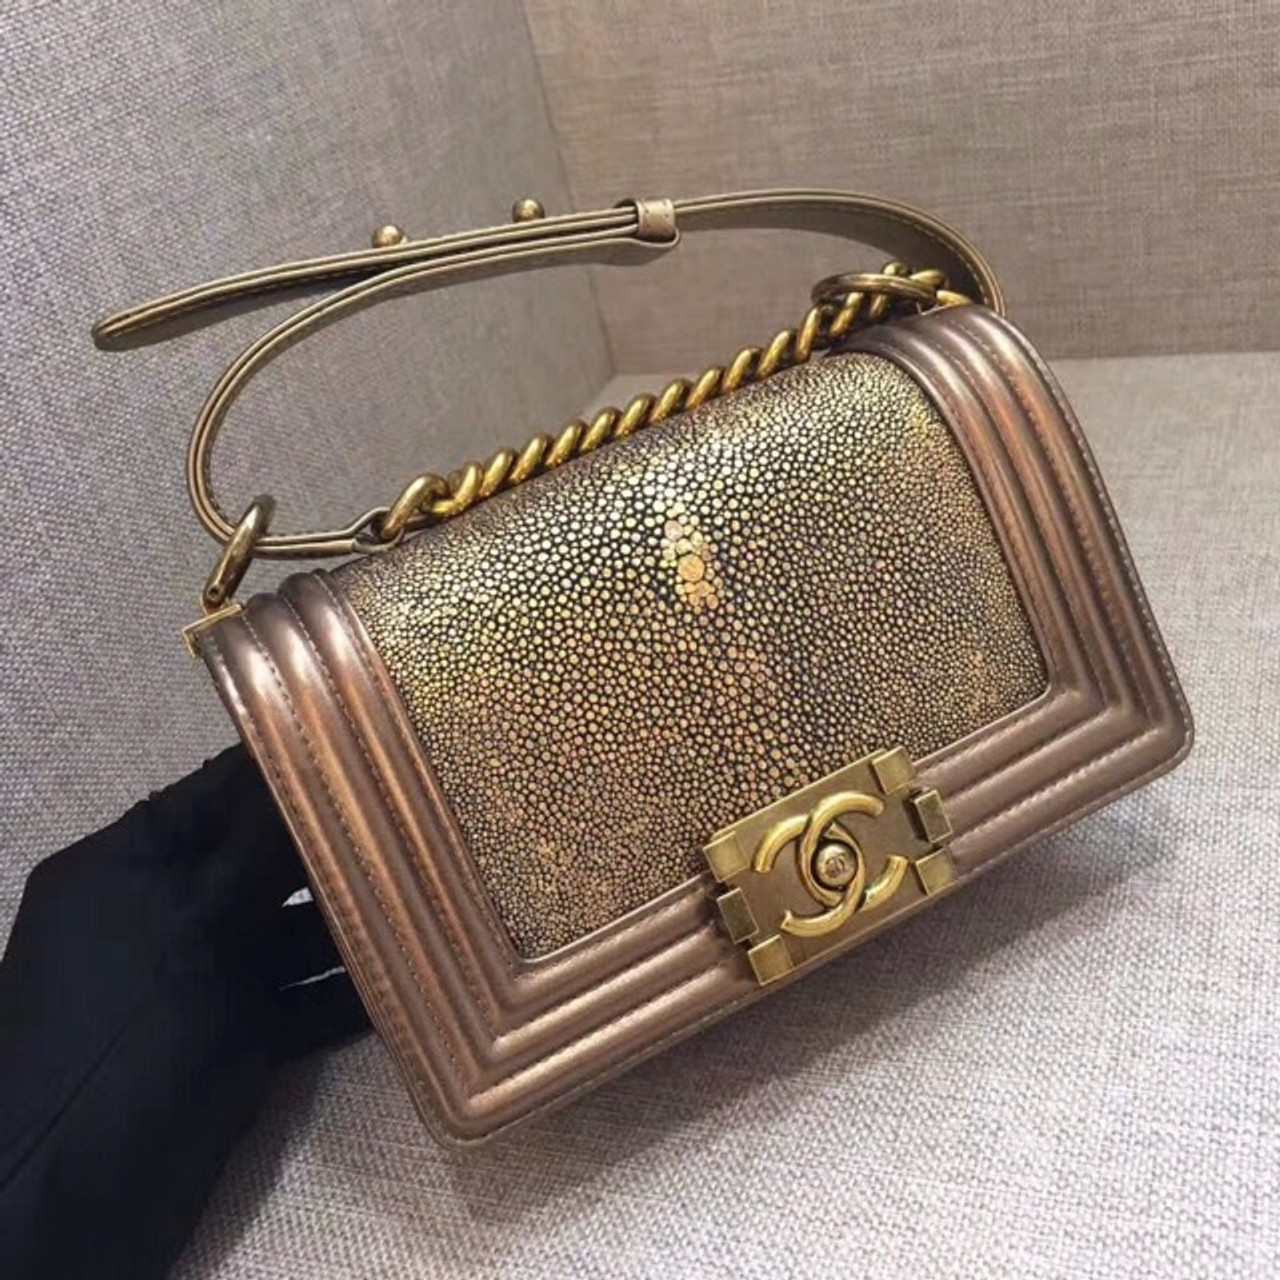 46256cada8e5 Chanel Metallic Gold Stingray Small Boy Bag - Bella Vita Moda